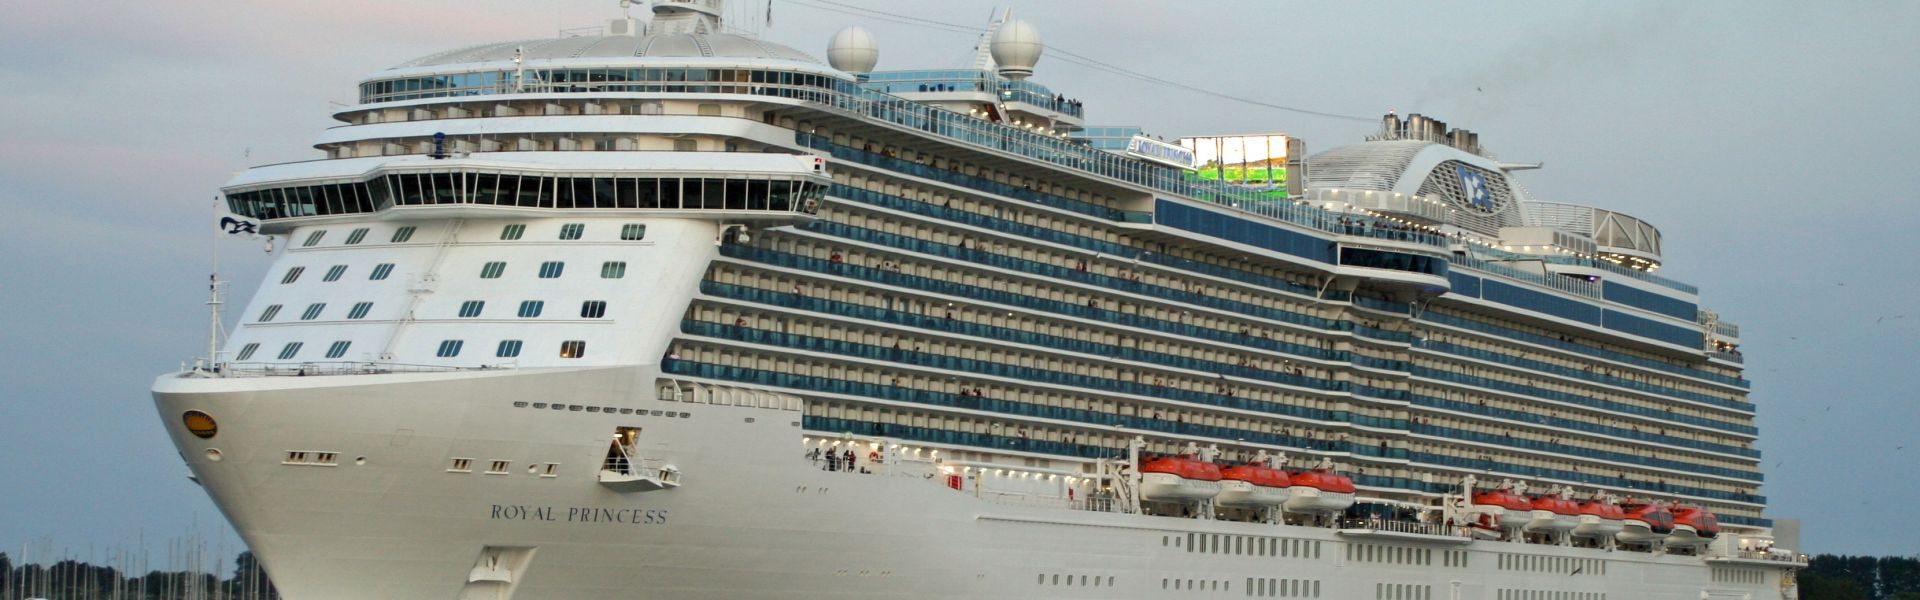 Croaziera 2017 - Caraibele de Sud (Fort Lauderdale) - Princess Cruises - Royal Princess - 10 nopti